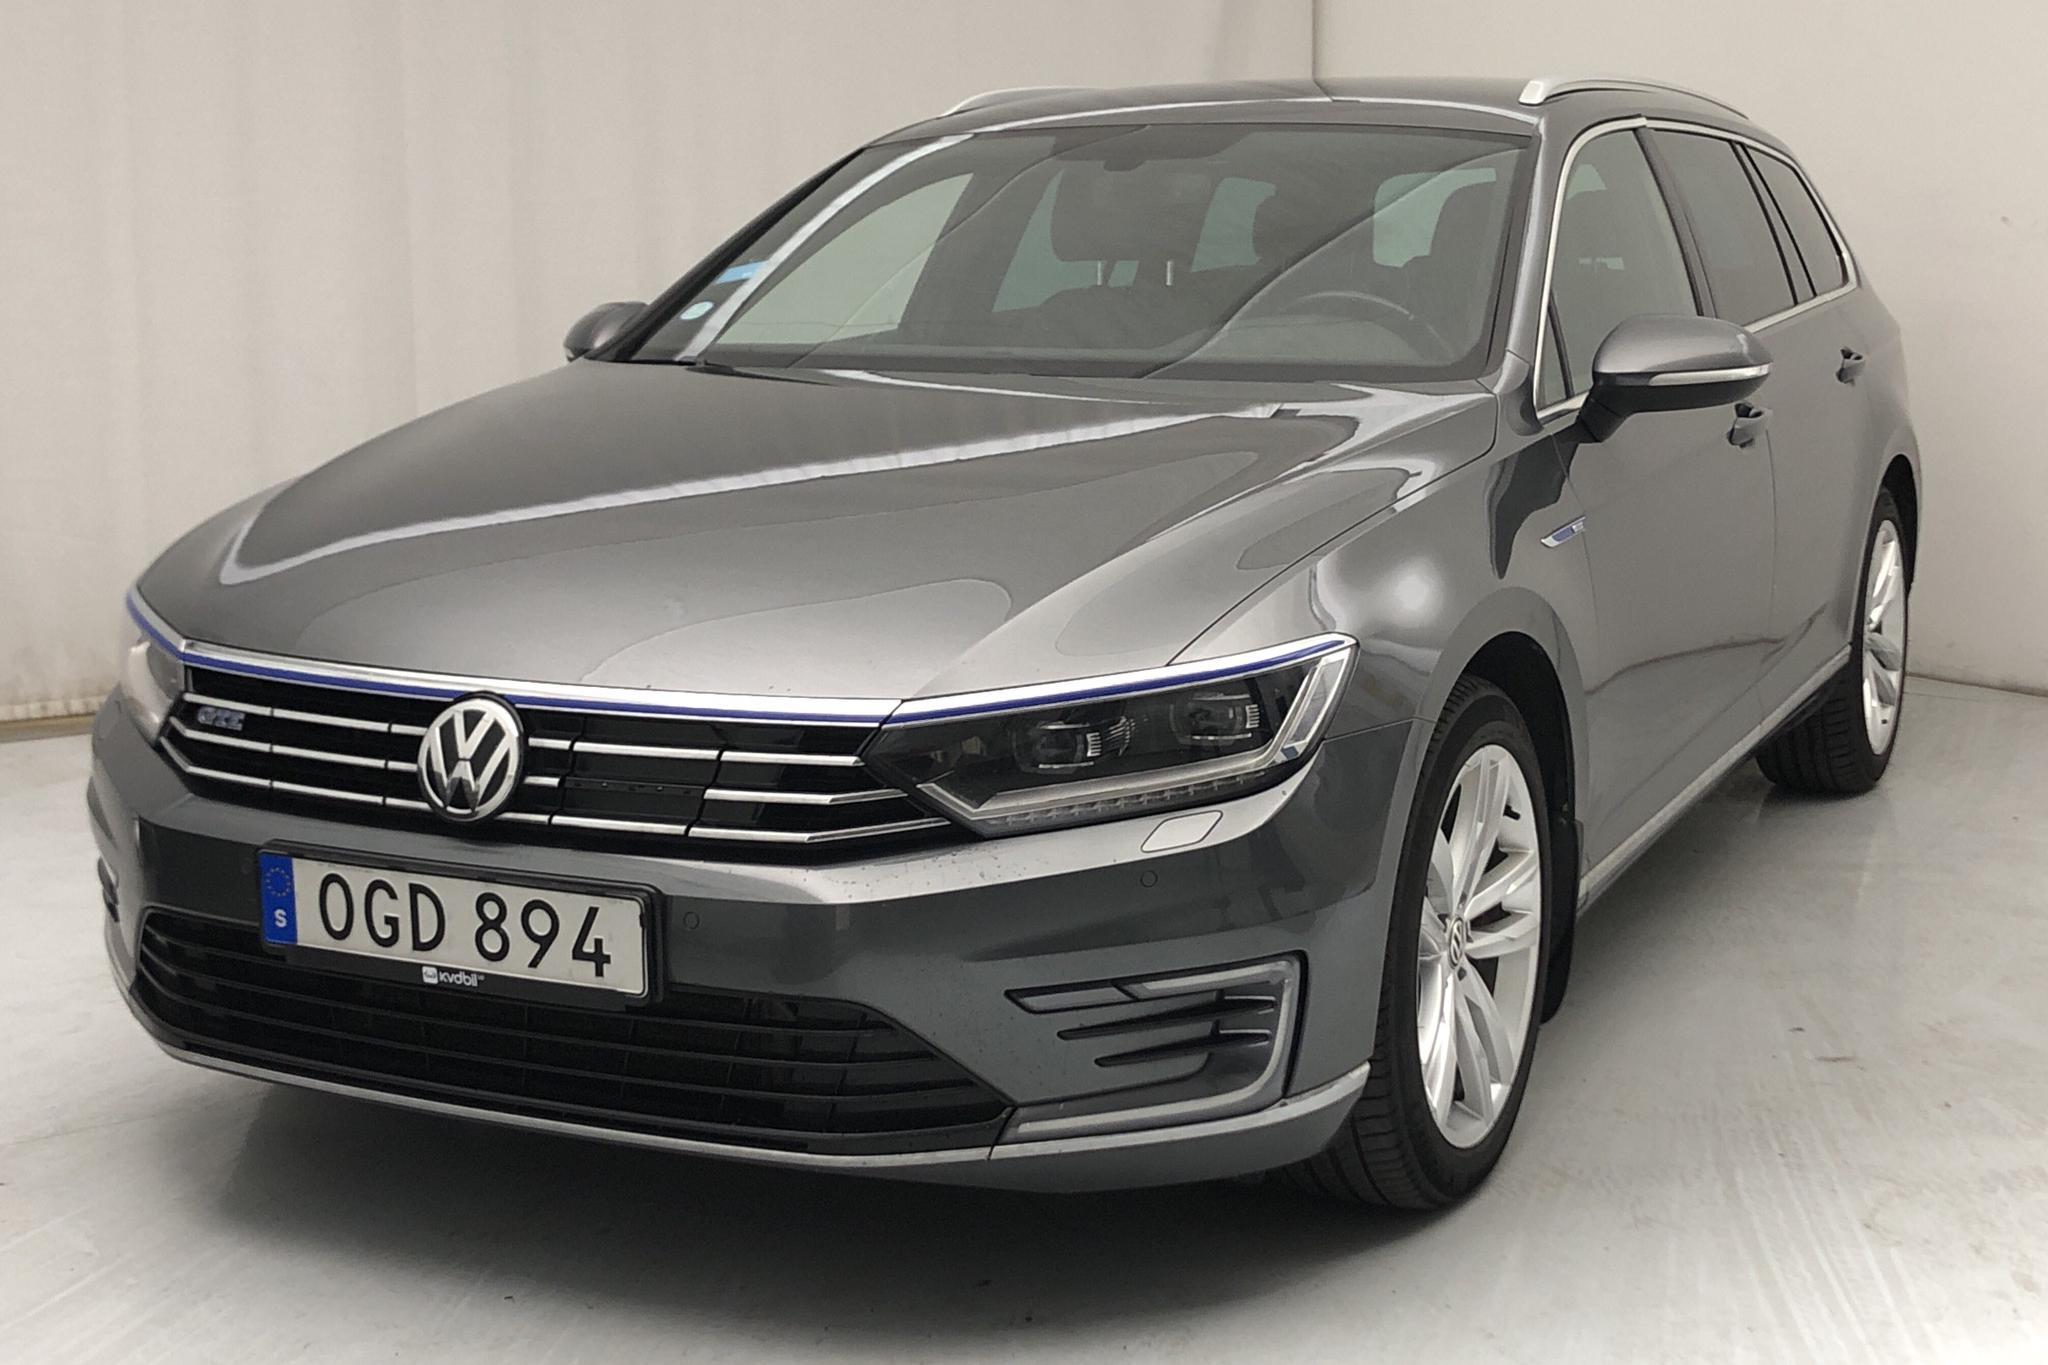 VW Passat 1.4 Plug-in-Hybrid Sportscombi (218hk) - 11 093 mil - Automat - Dark Grey - 2017